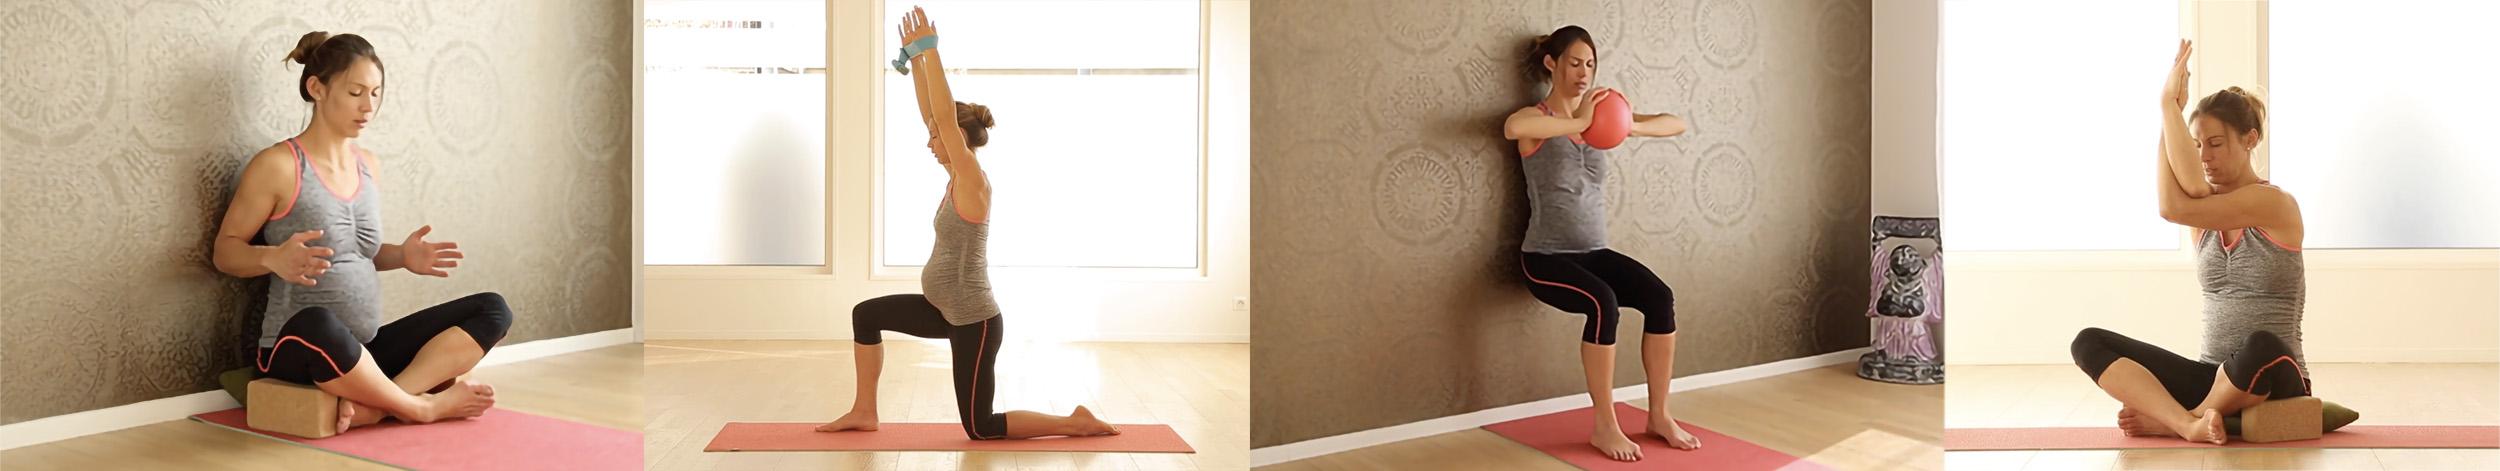 Pregnancy workout routine & wellness plan - The Mommy Body Bliss Pregnancy Program